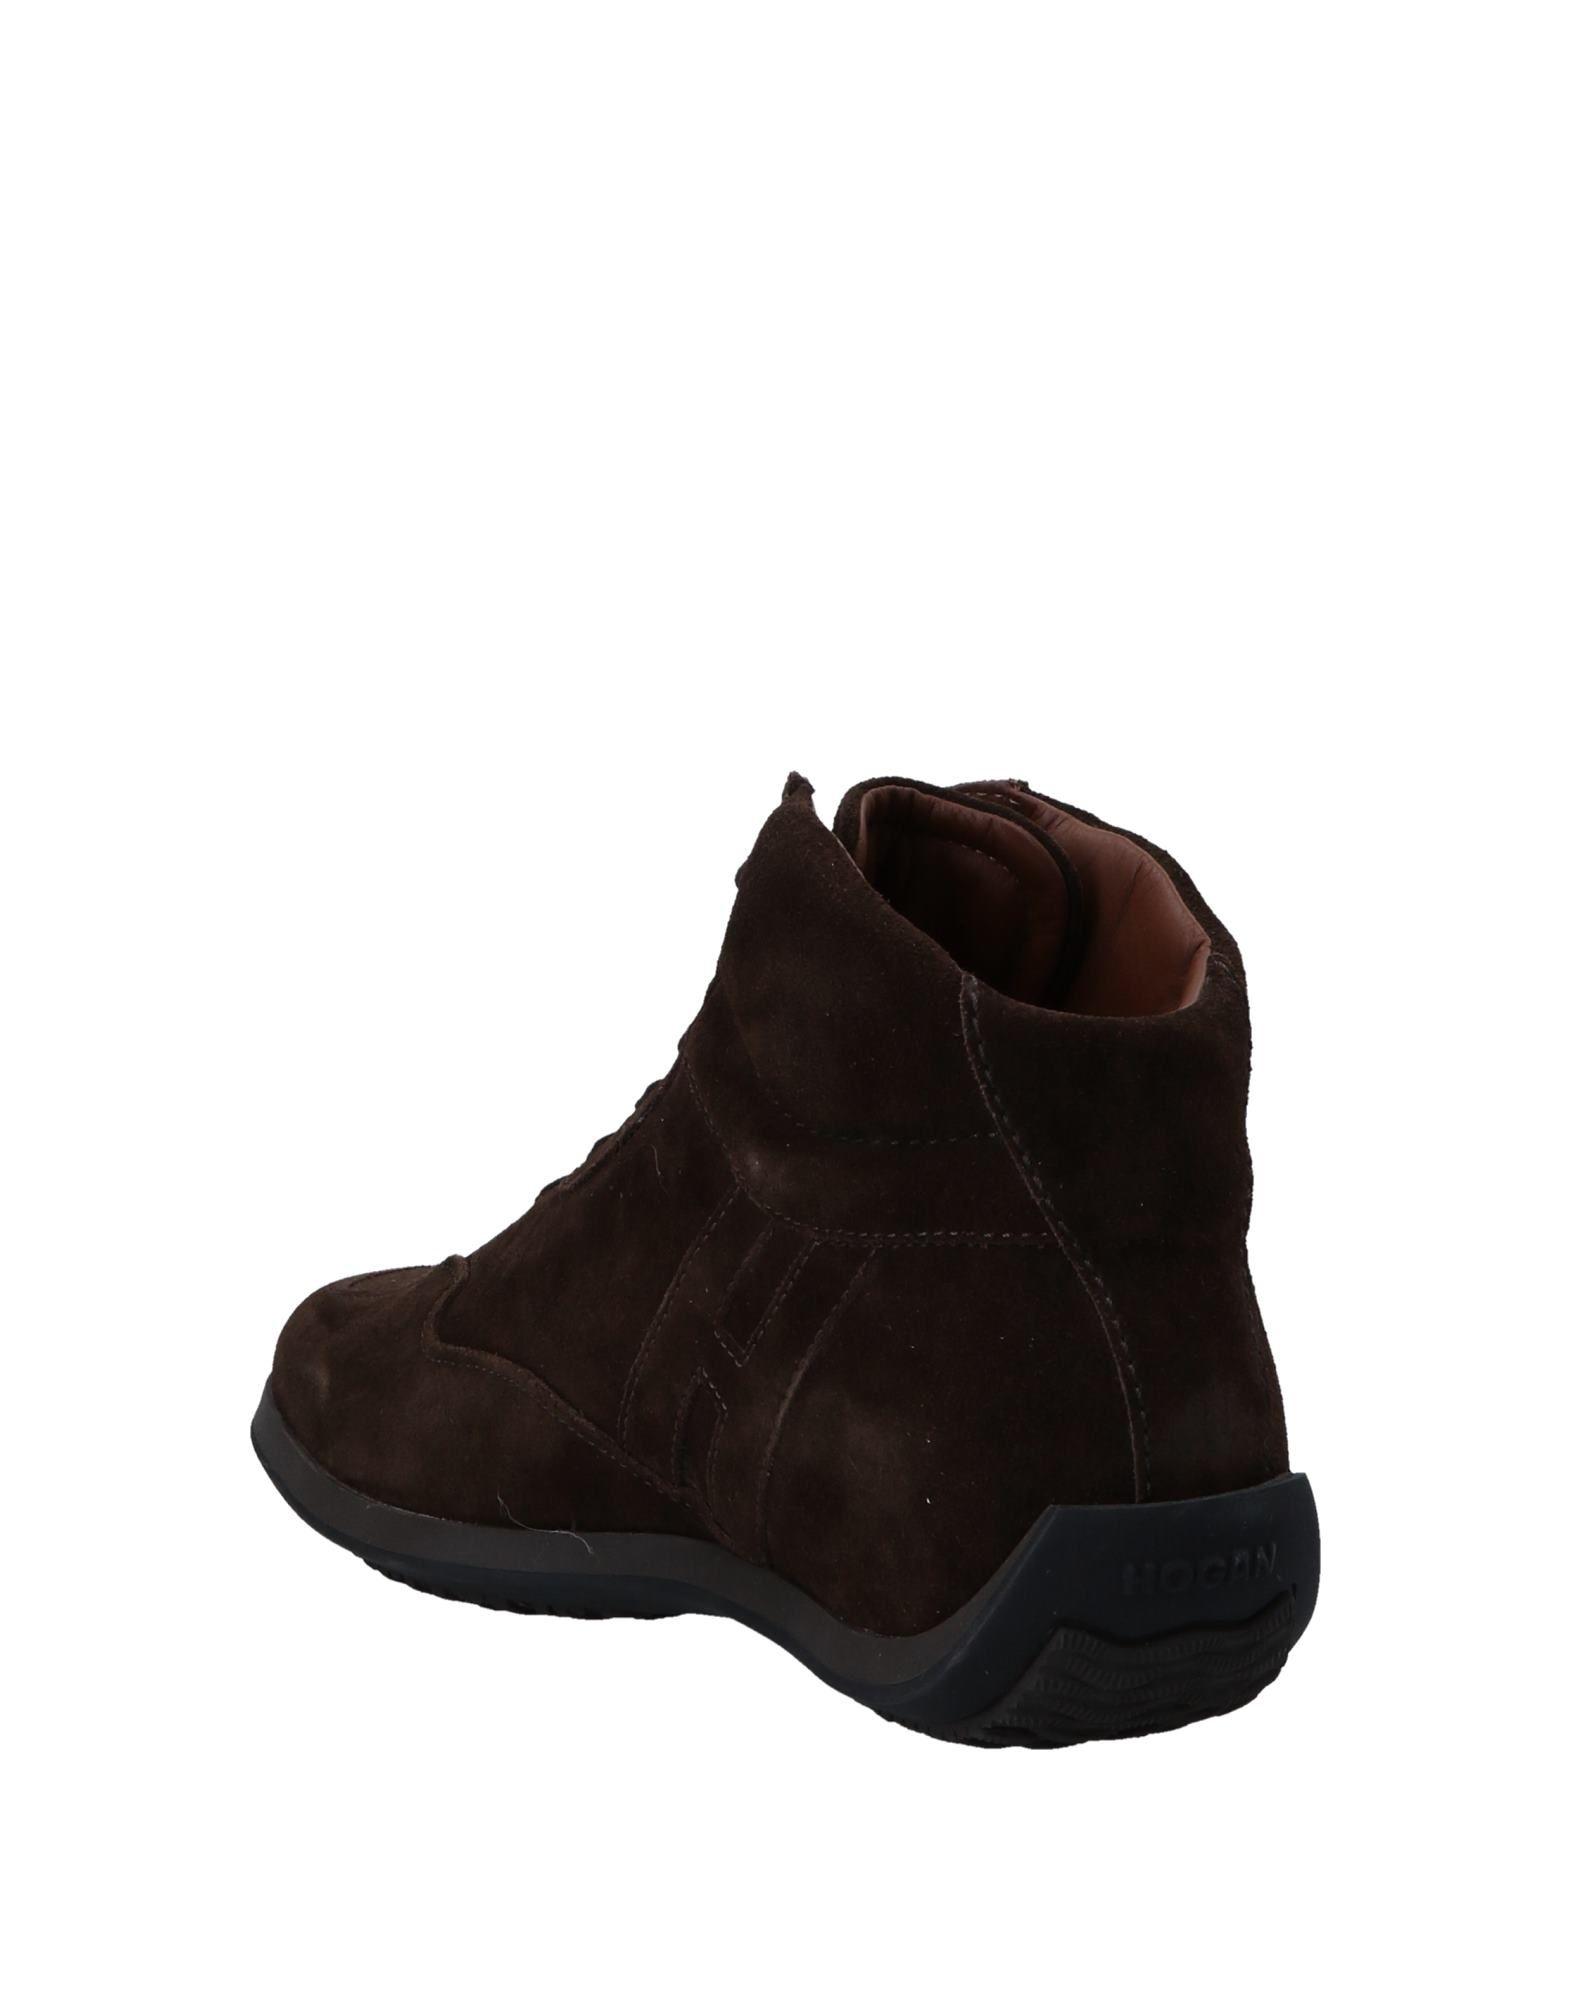 Hogan Sneakers - Men Hogan Hogan Hogan Sneakers online on  United Kingdom - 11559939PT 66e717